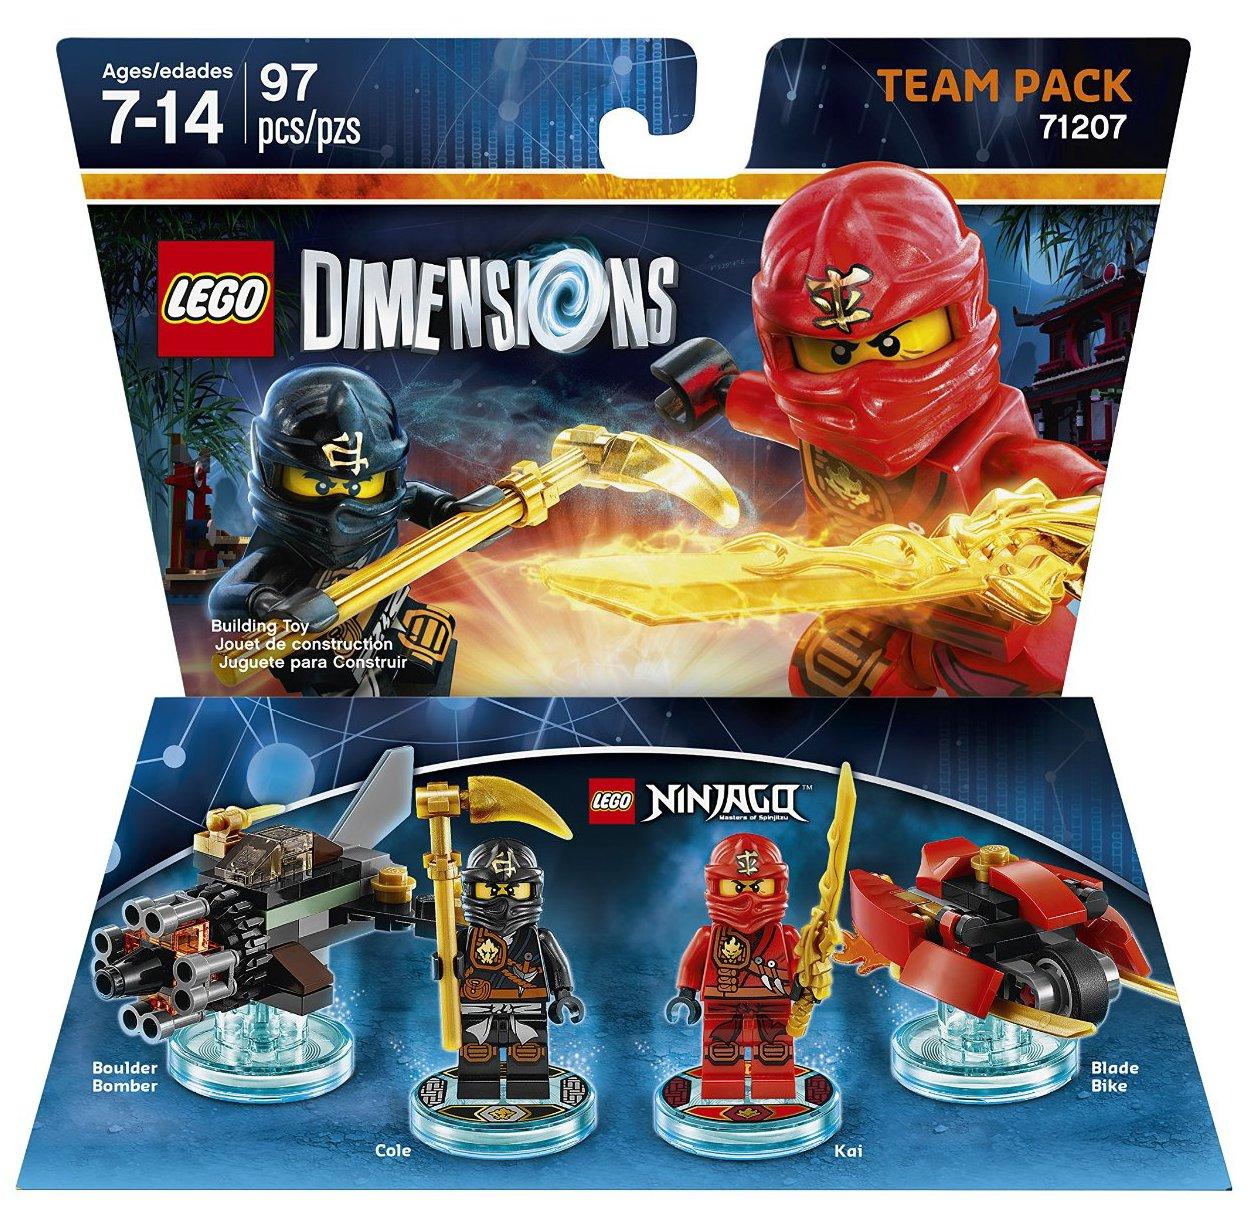 ninjago team pack - Jeux De Lego Ninjago Gratuit